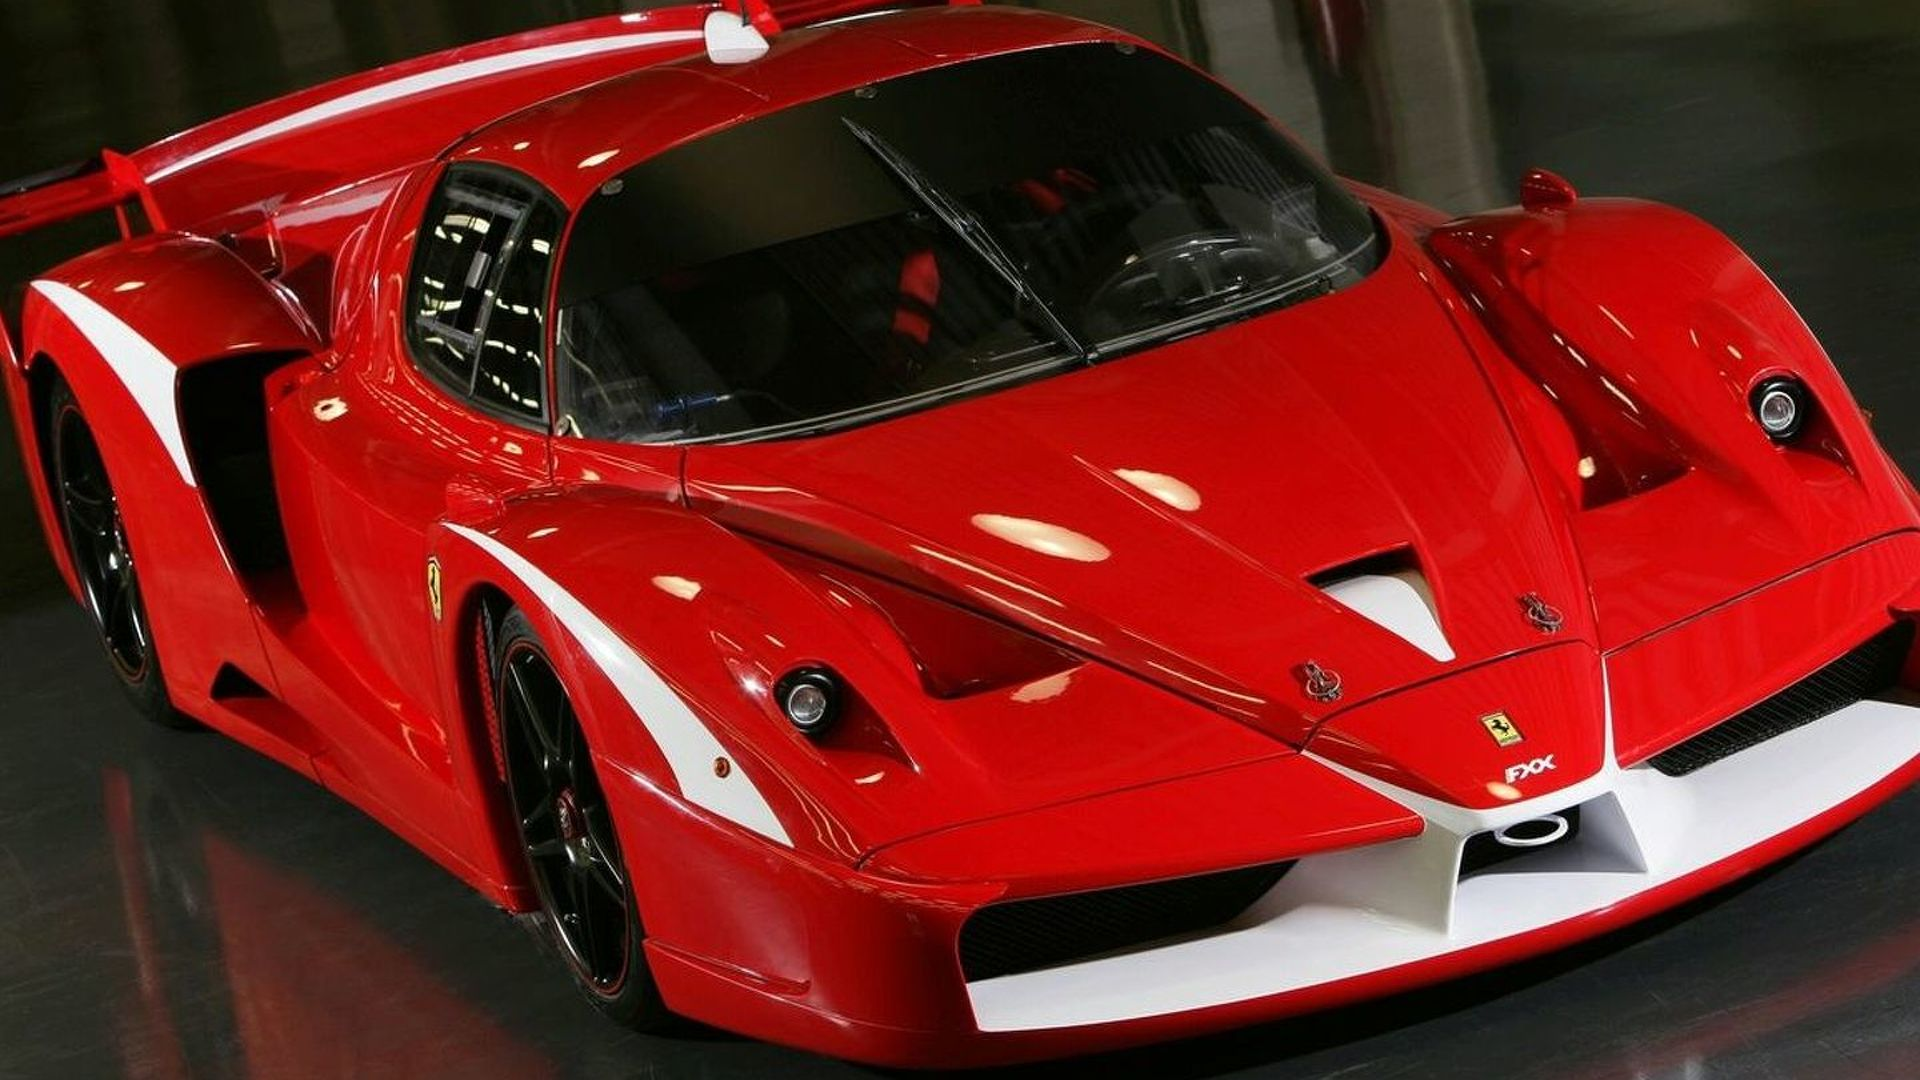 Ferrari Fxx Evoluzione Goes Up For Sale Costs 2 2 Million